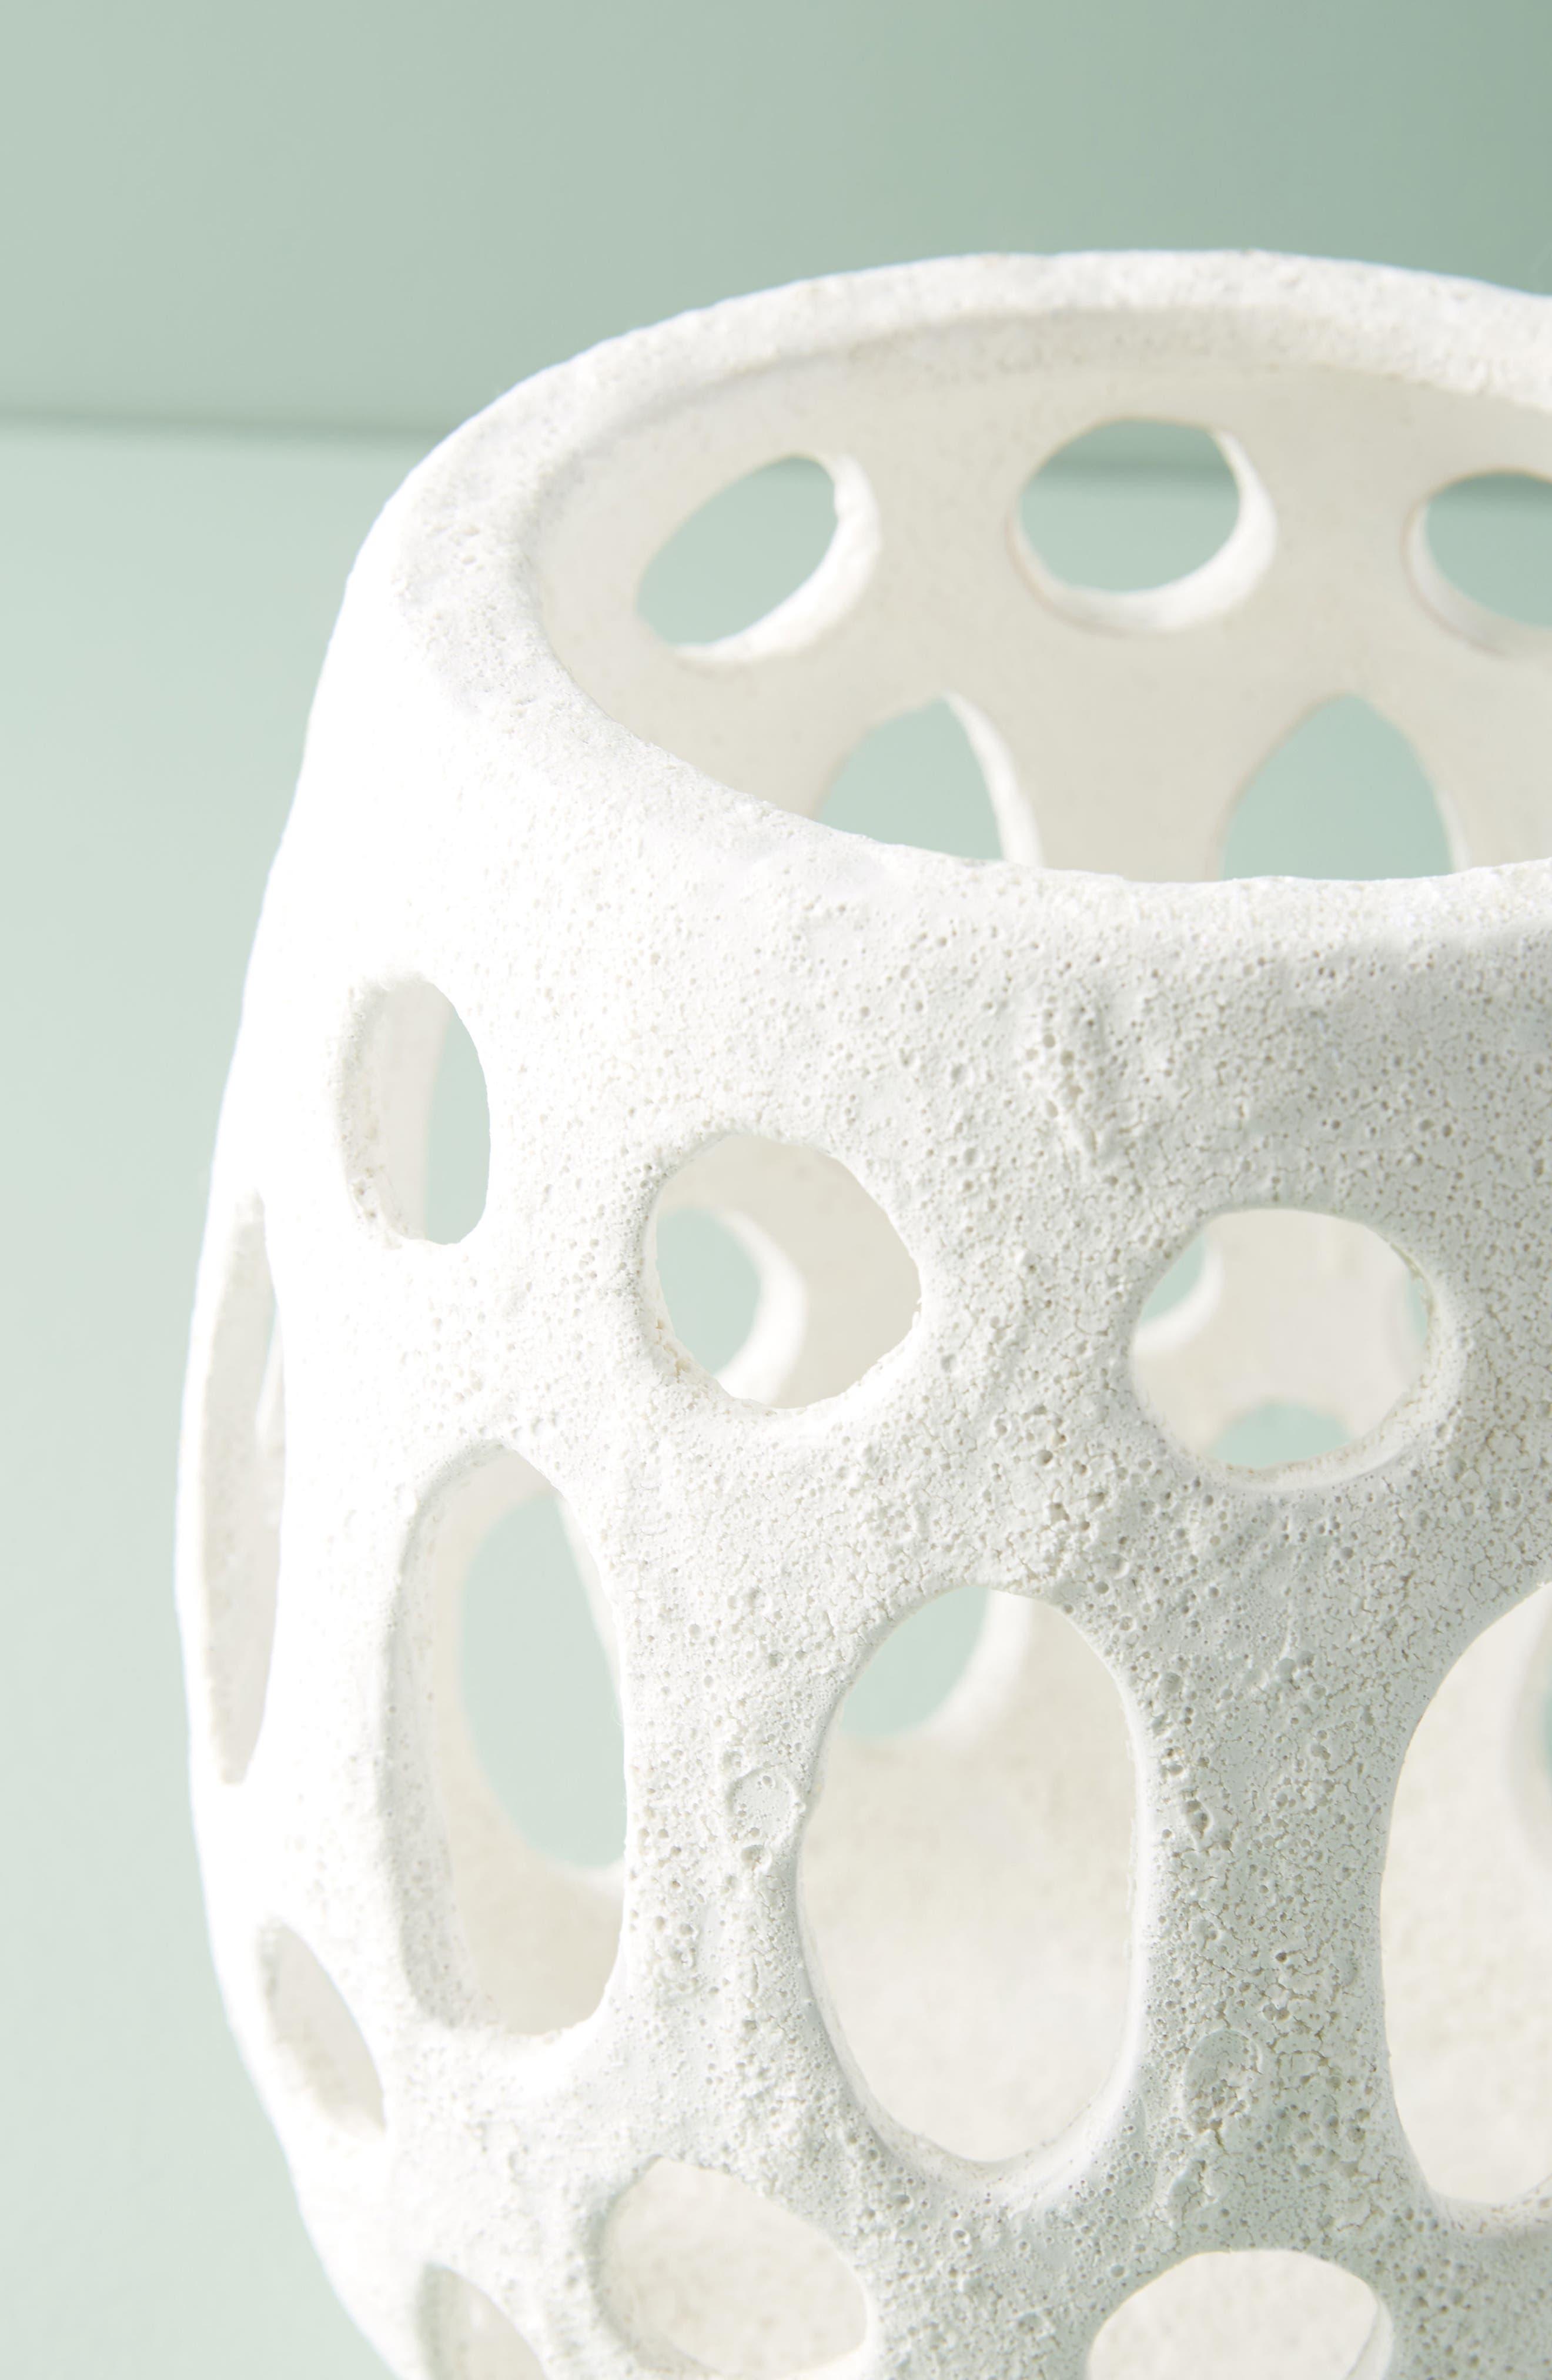 Hand Carved Ceramic Hurricane Candleholder,                             Alternate thumbnail 3, color,                             WHITE - LARGE